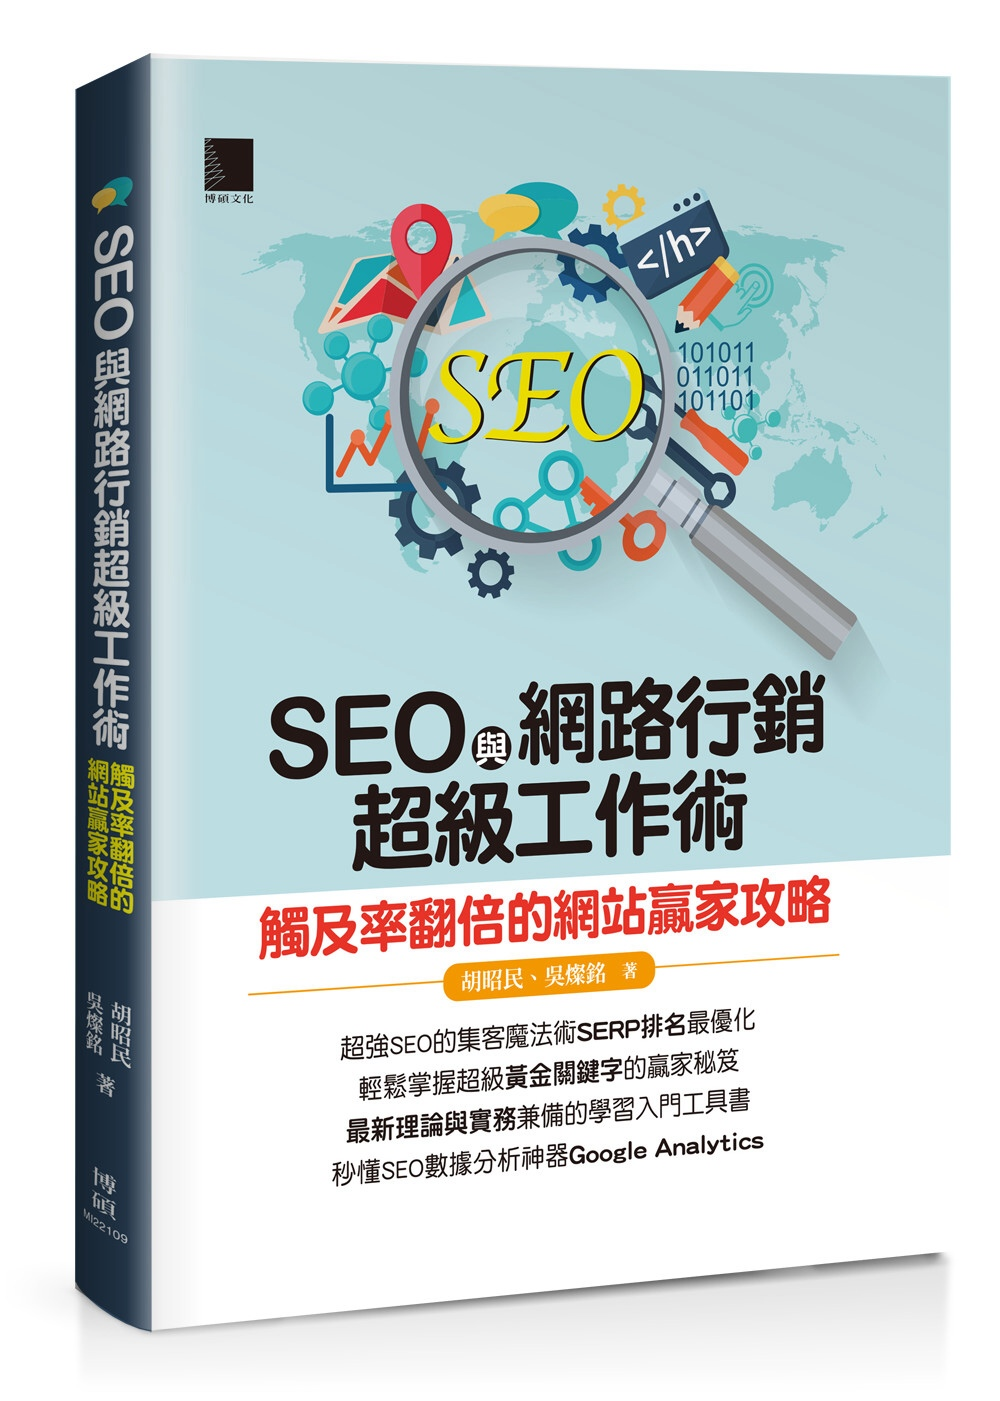 SEO與網路行銷超級工作術:觸...